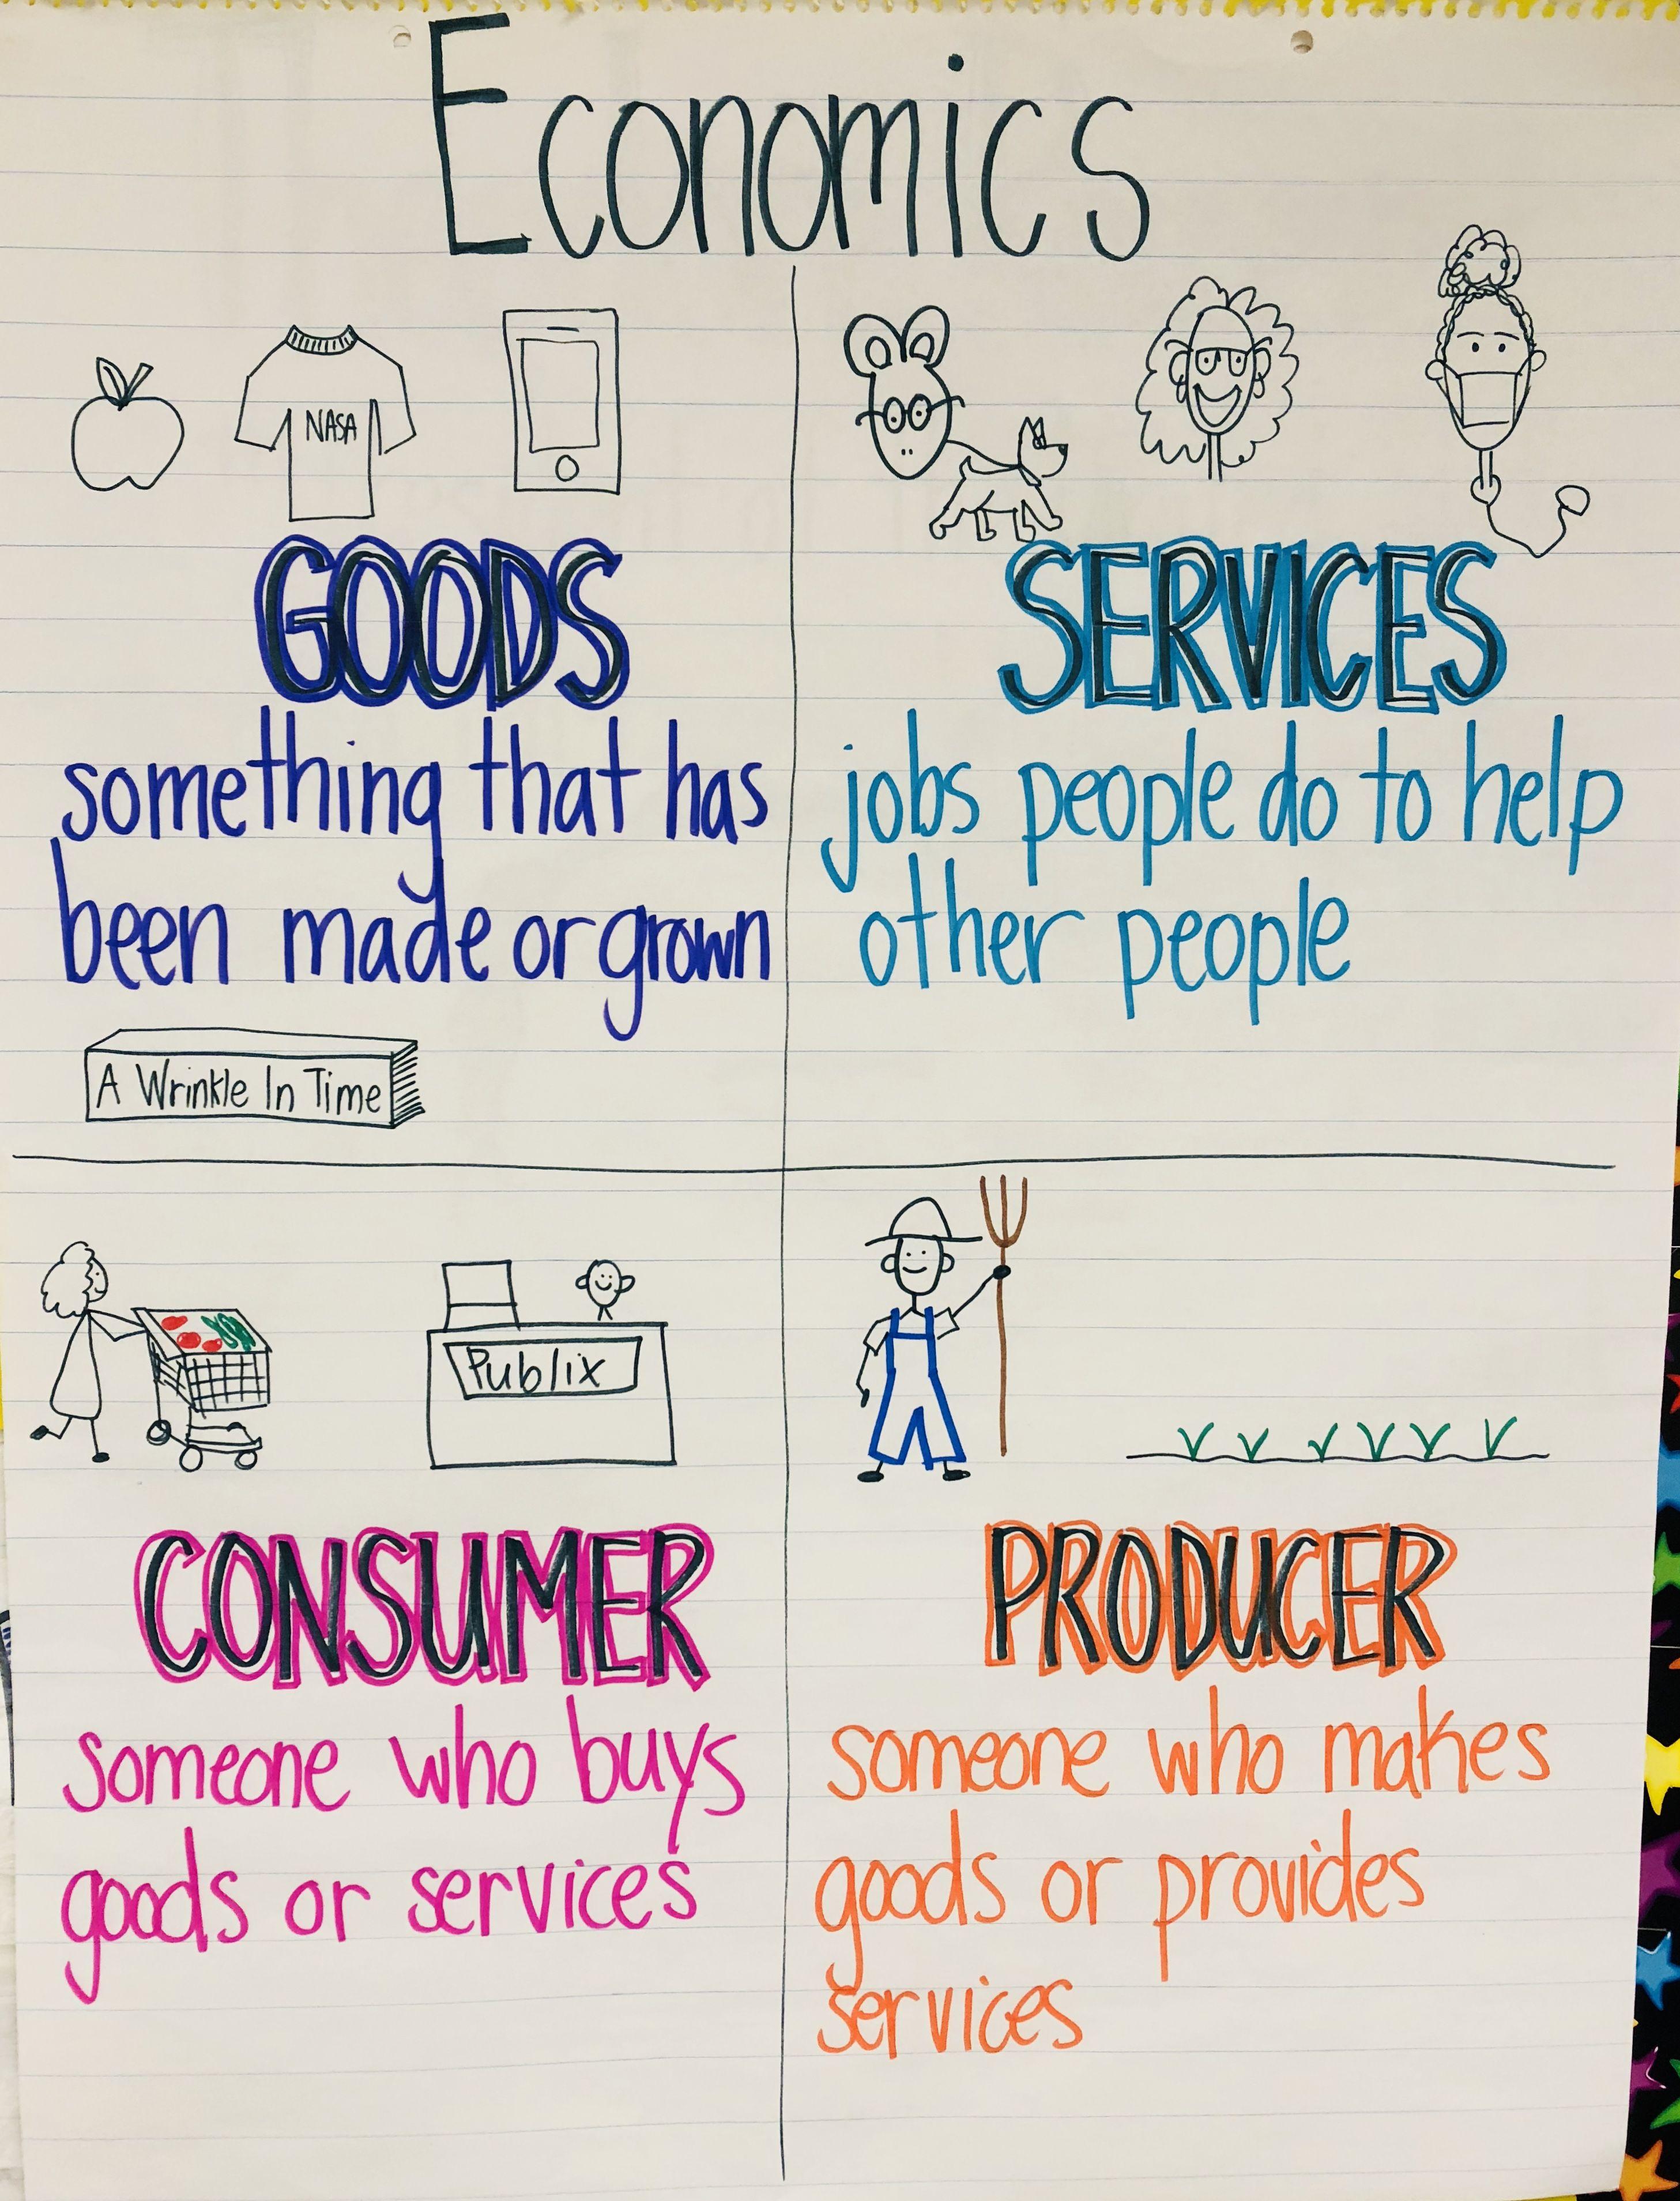 Economics Goods Services Consumer Producer